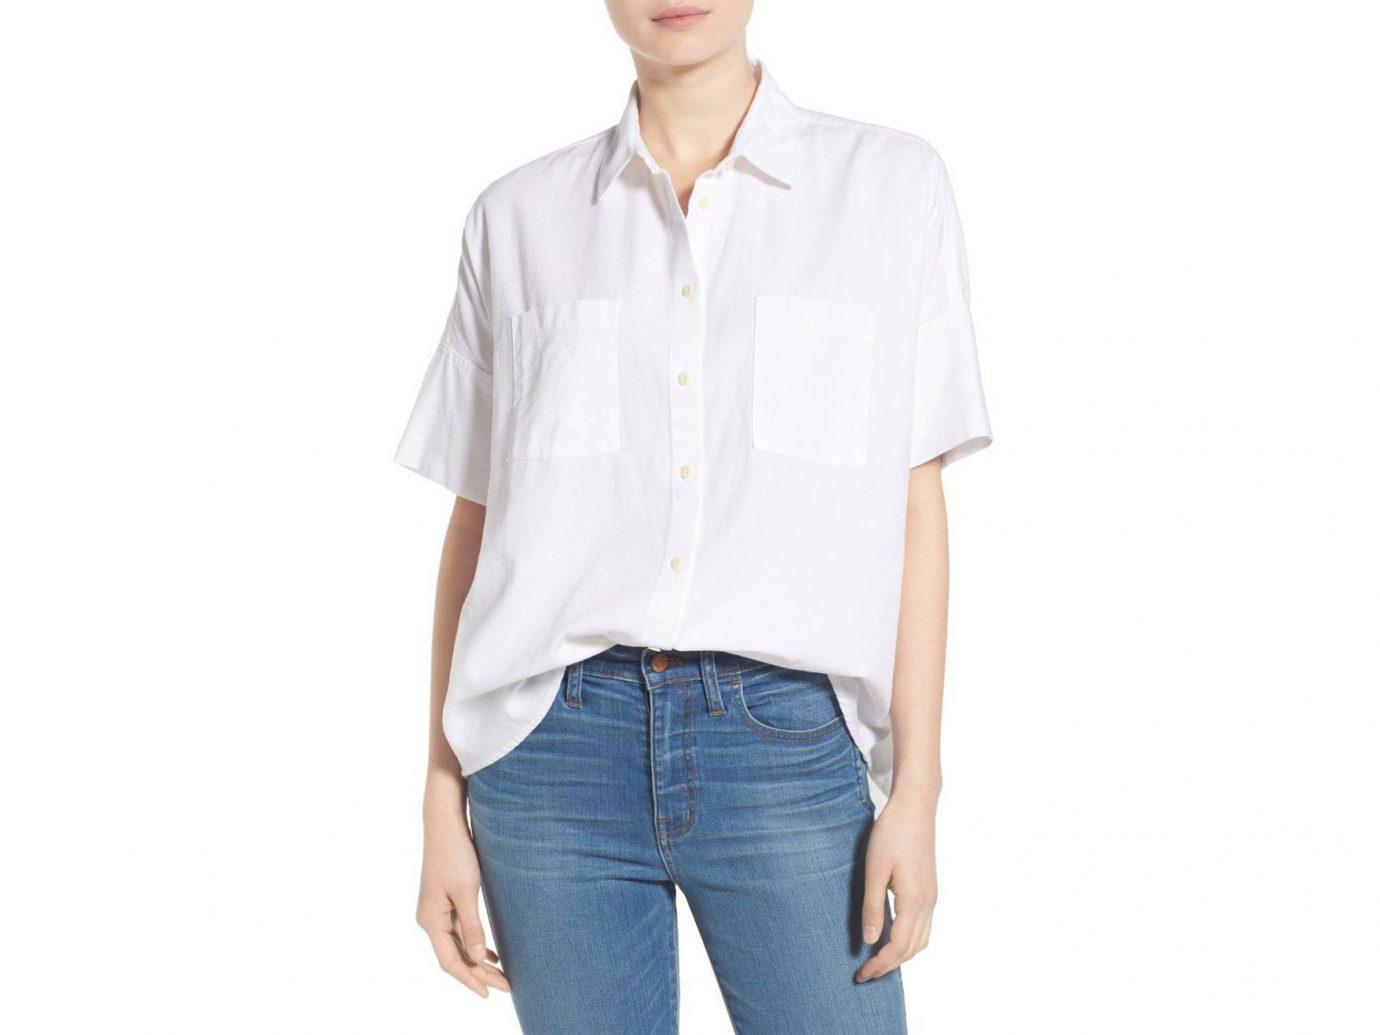 Style + Design Travel Shop person clothing sleeve standing shoulder shirt posing button blouse neck dress shirt trouser